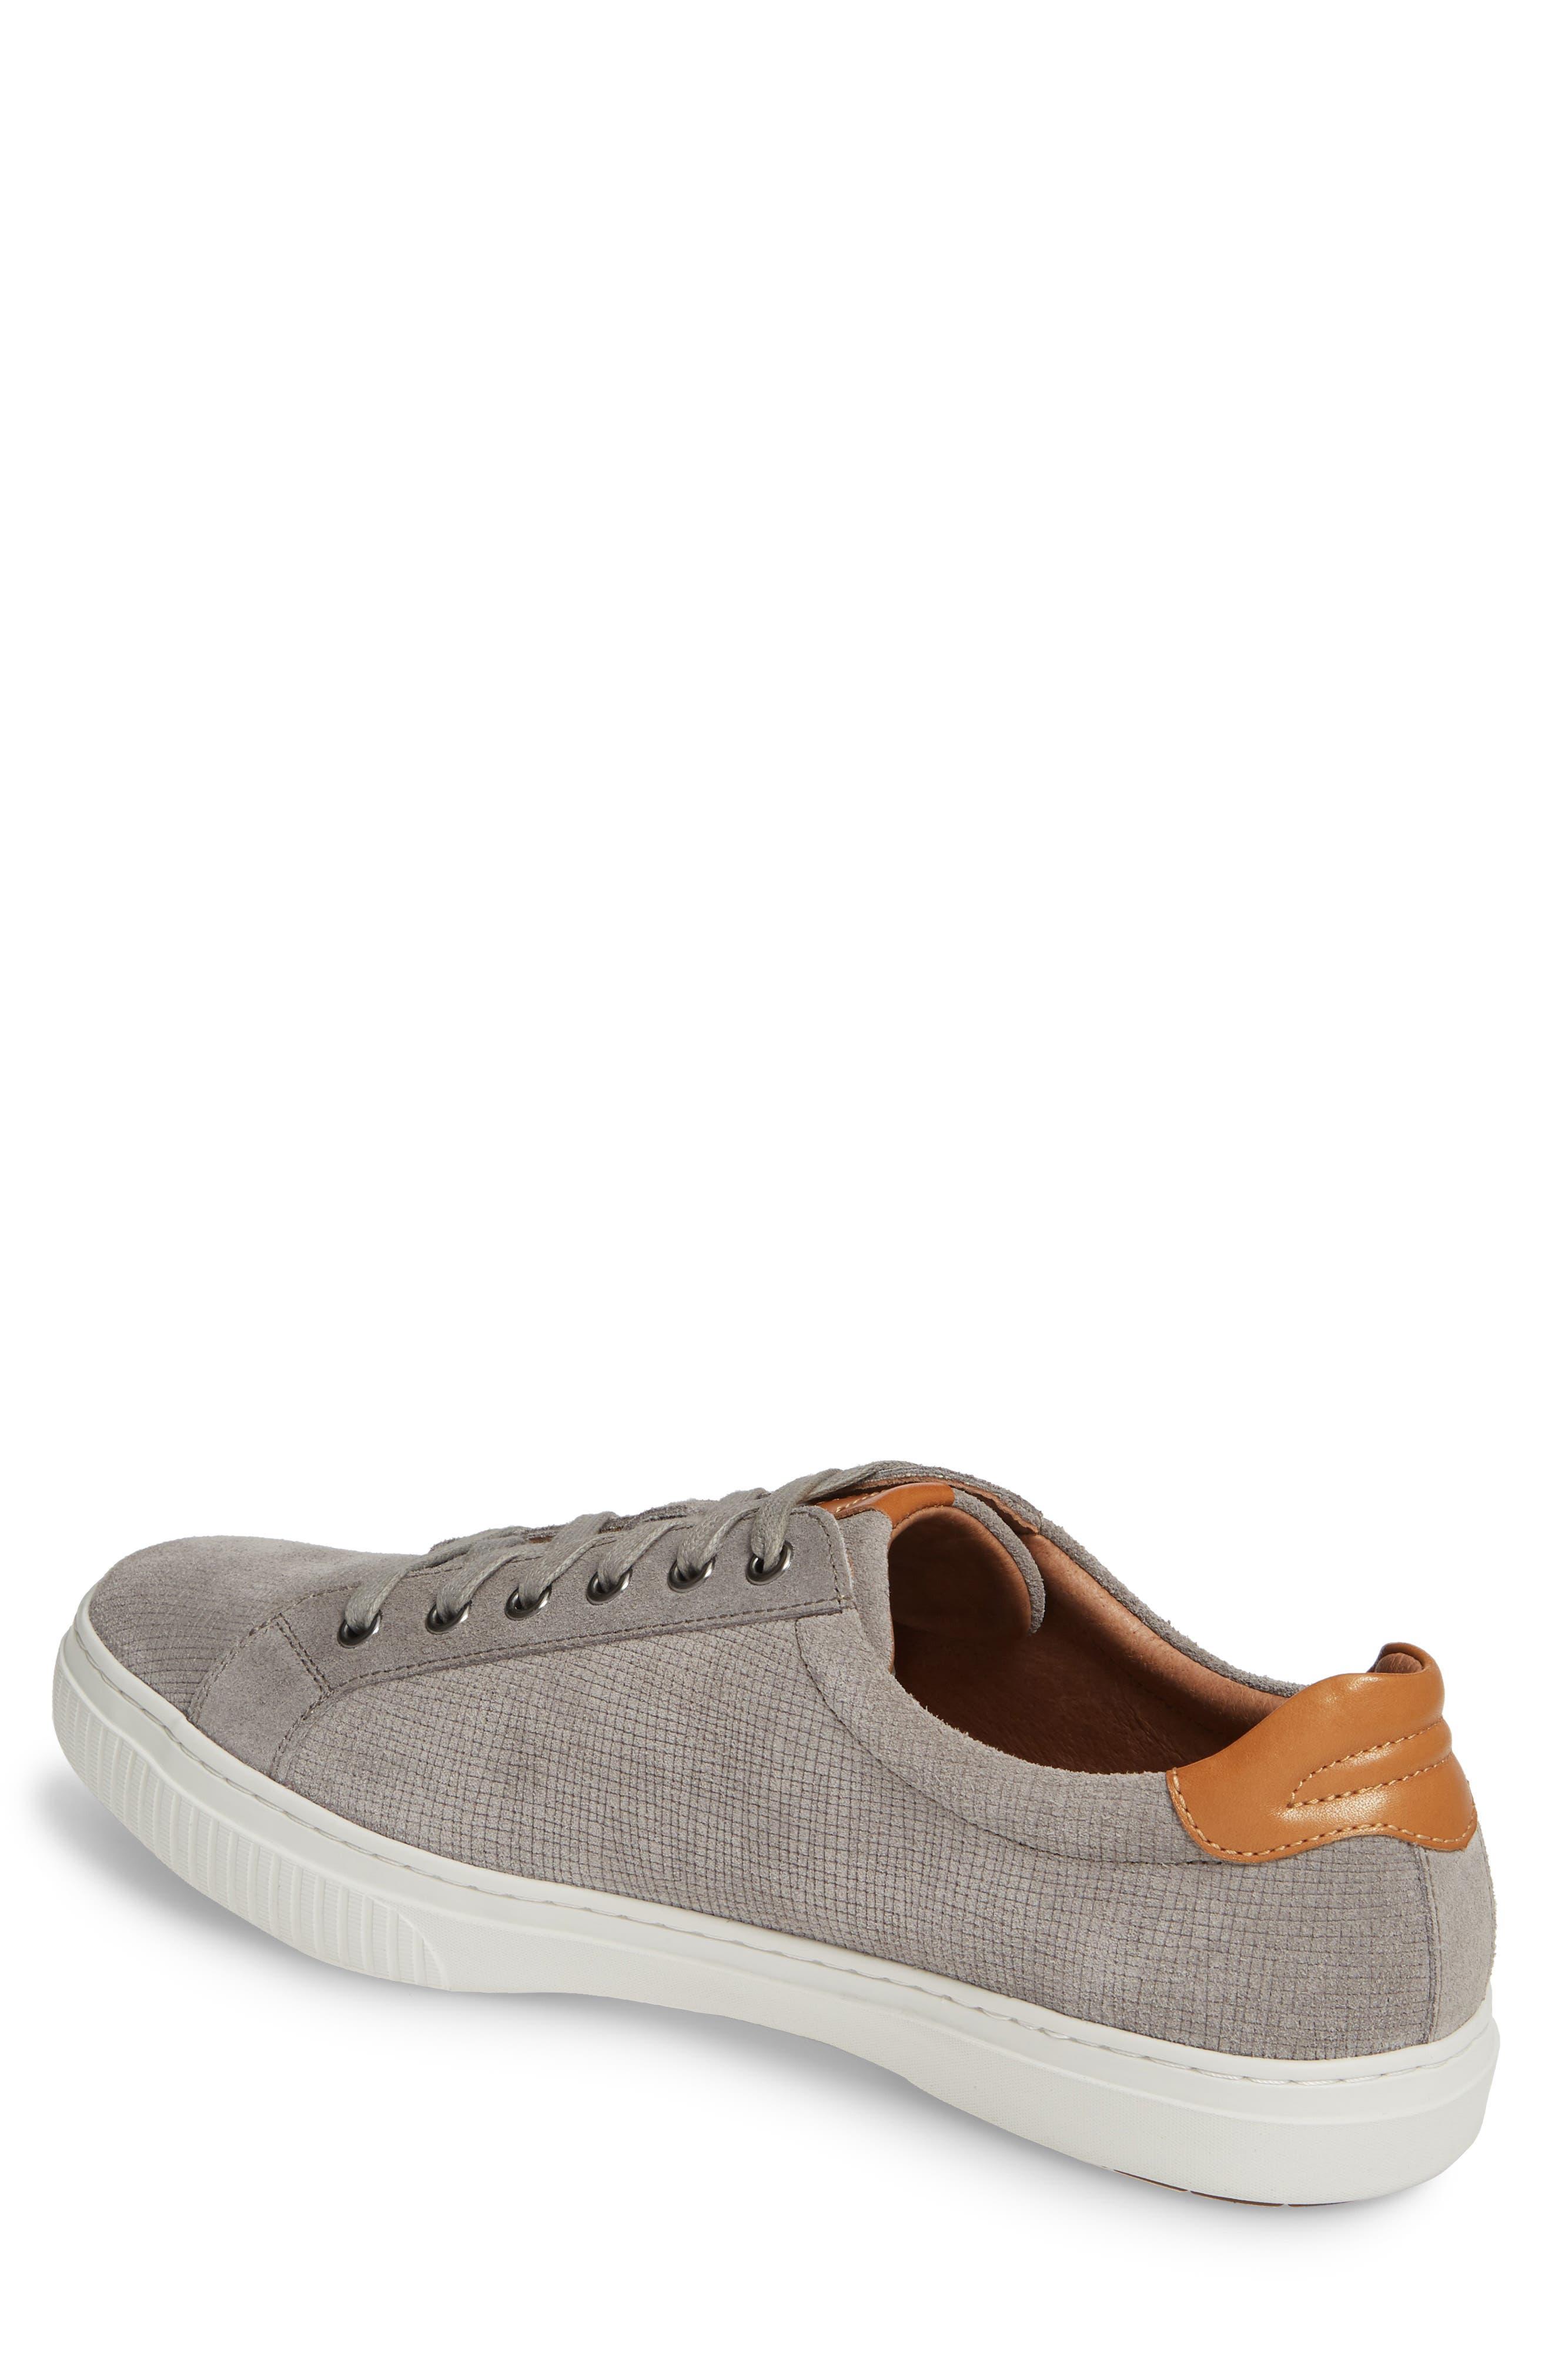 J&M 1850, Toliver Low Top Sneaker, Alternate thumbnail 2, color, GREY SUEDE